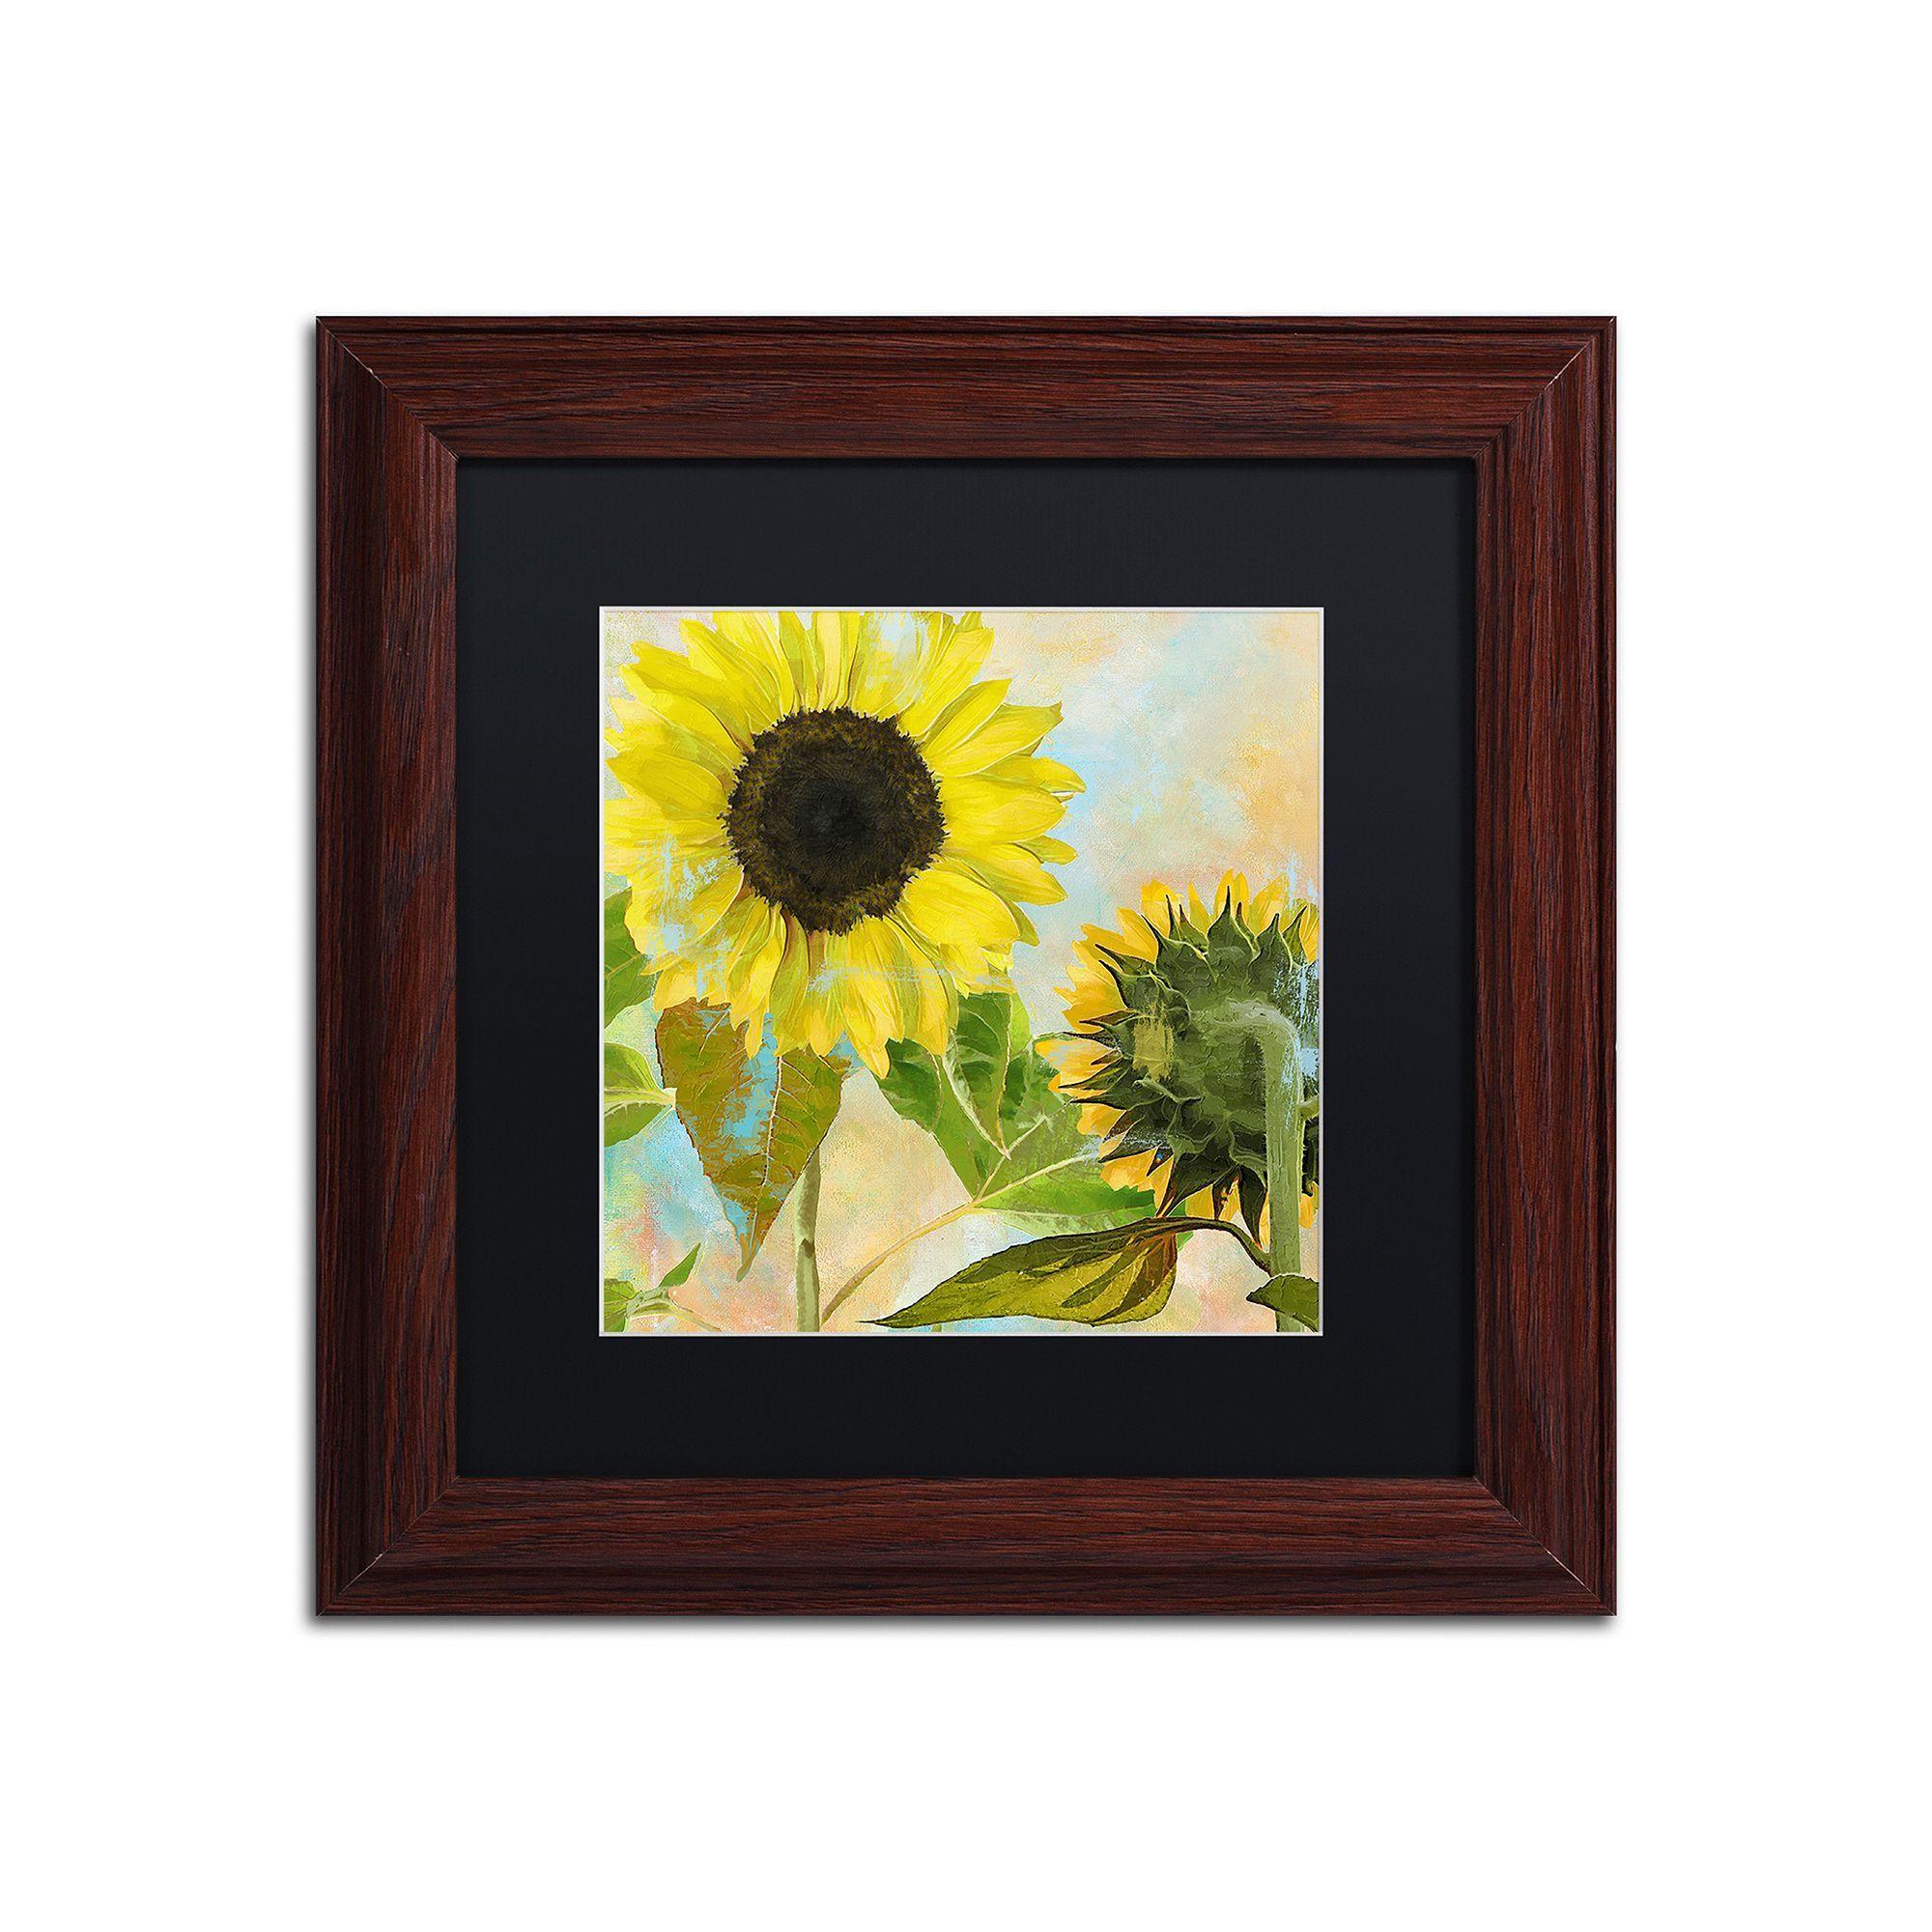 Trademark Fine Art Soleil I Framed Wall Art, Black | Framed wall art ...